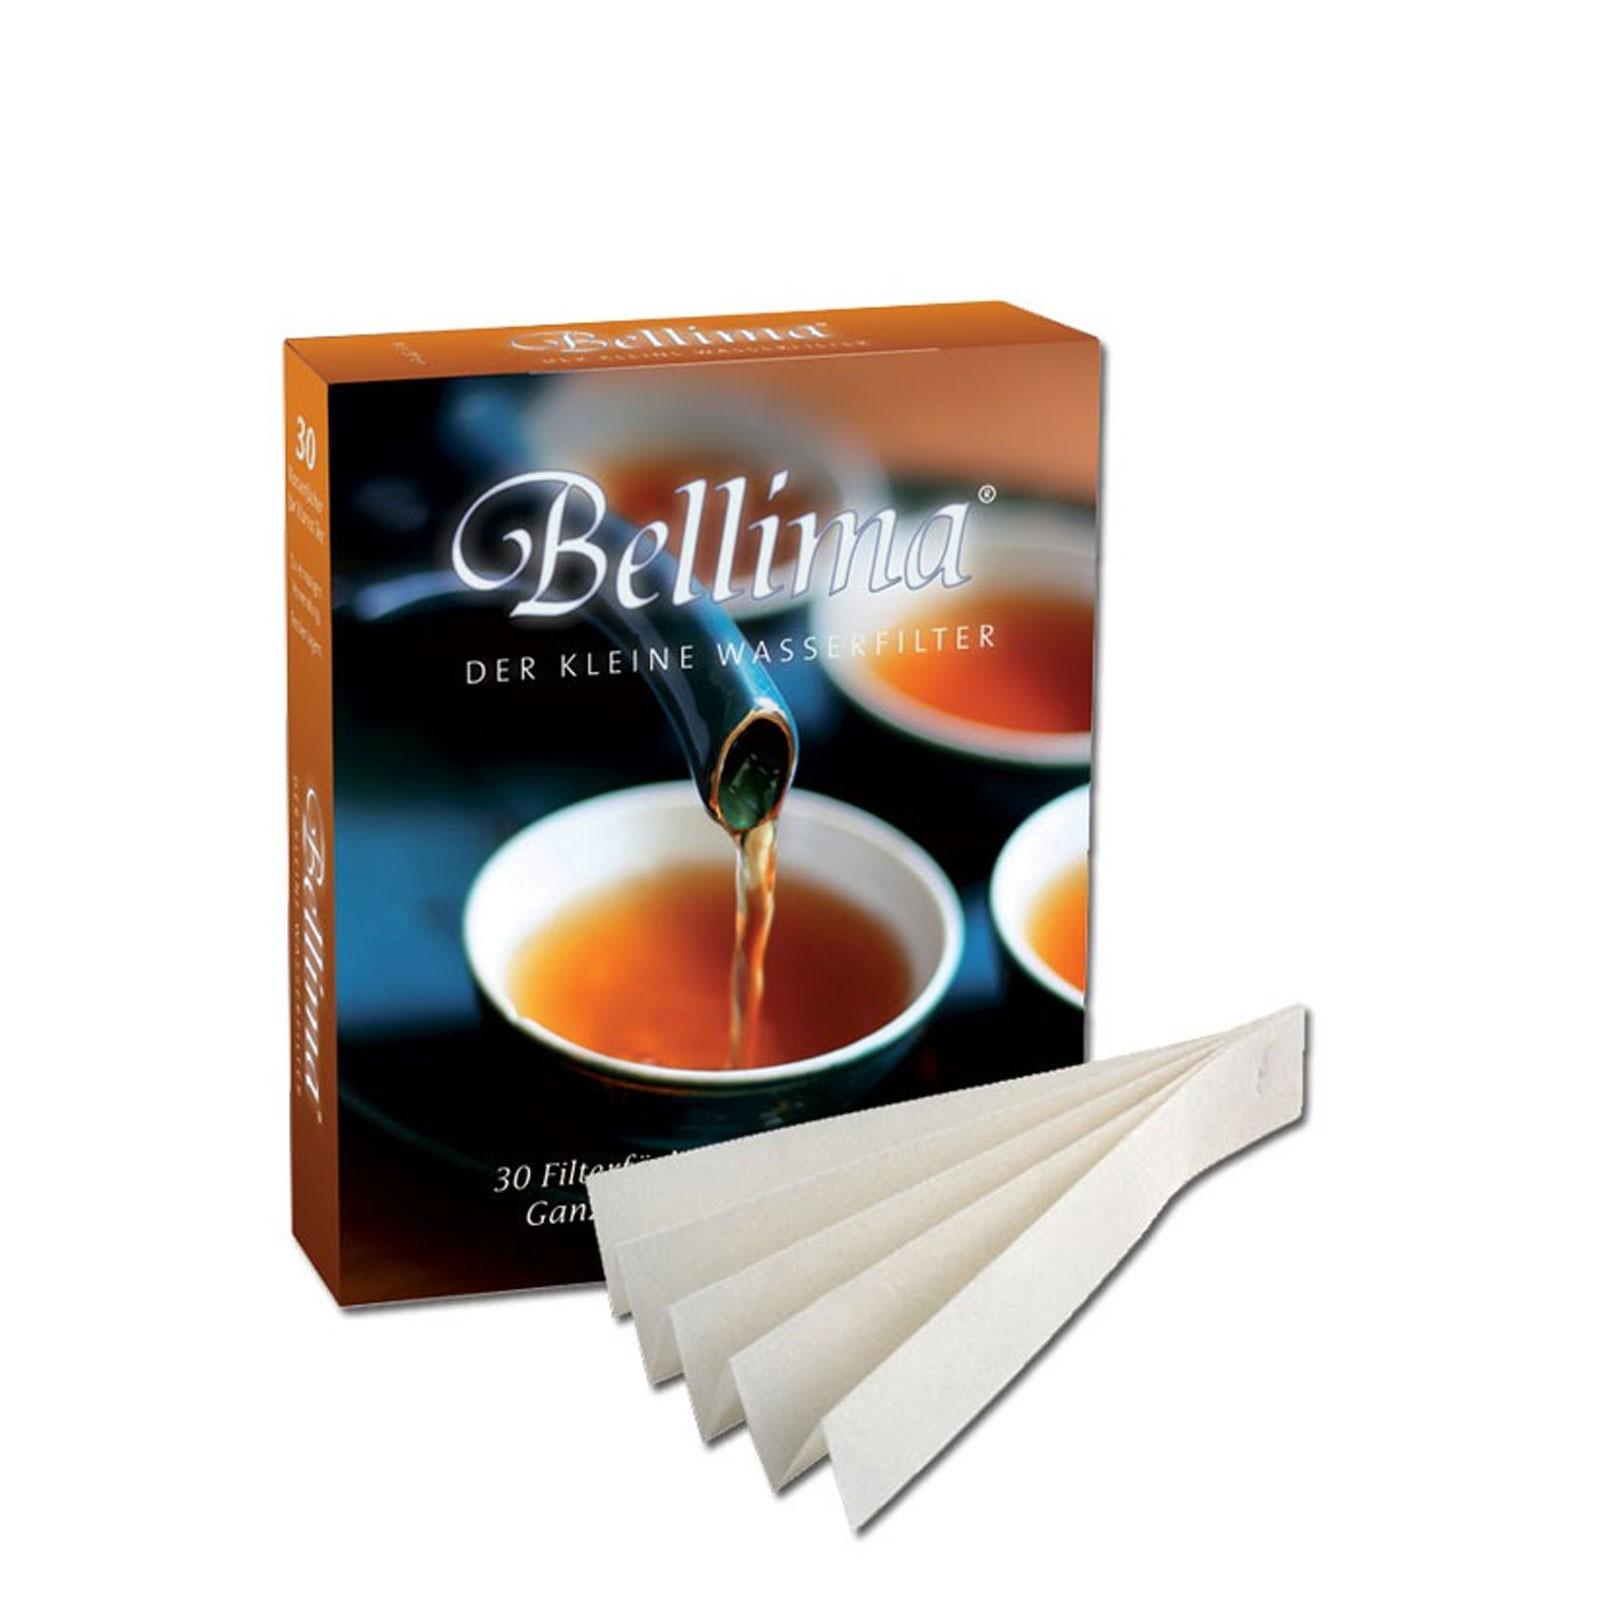 Bellima Wasserfilter 30 St'ck